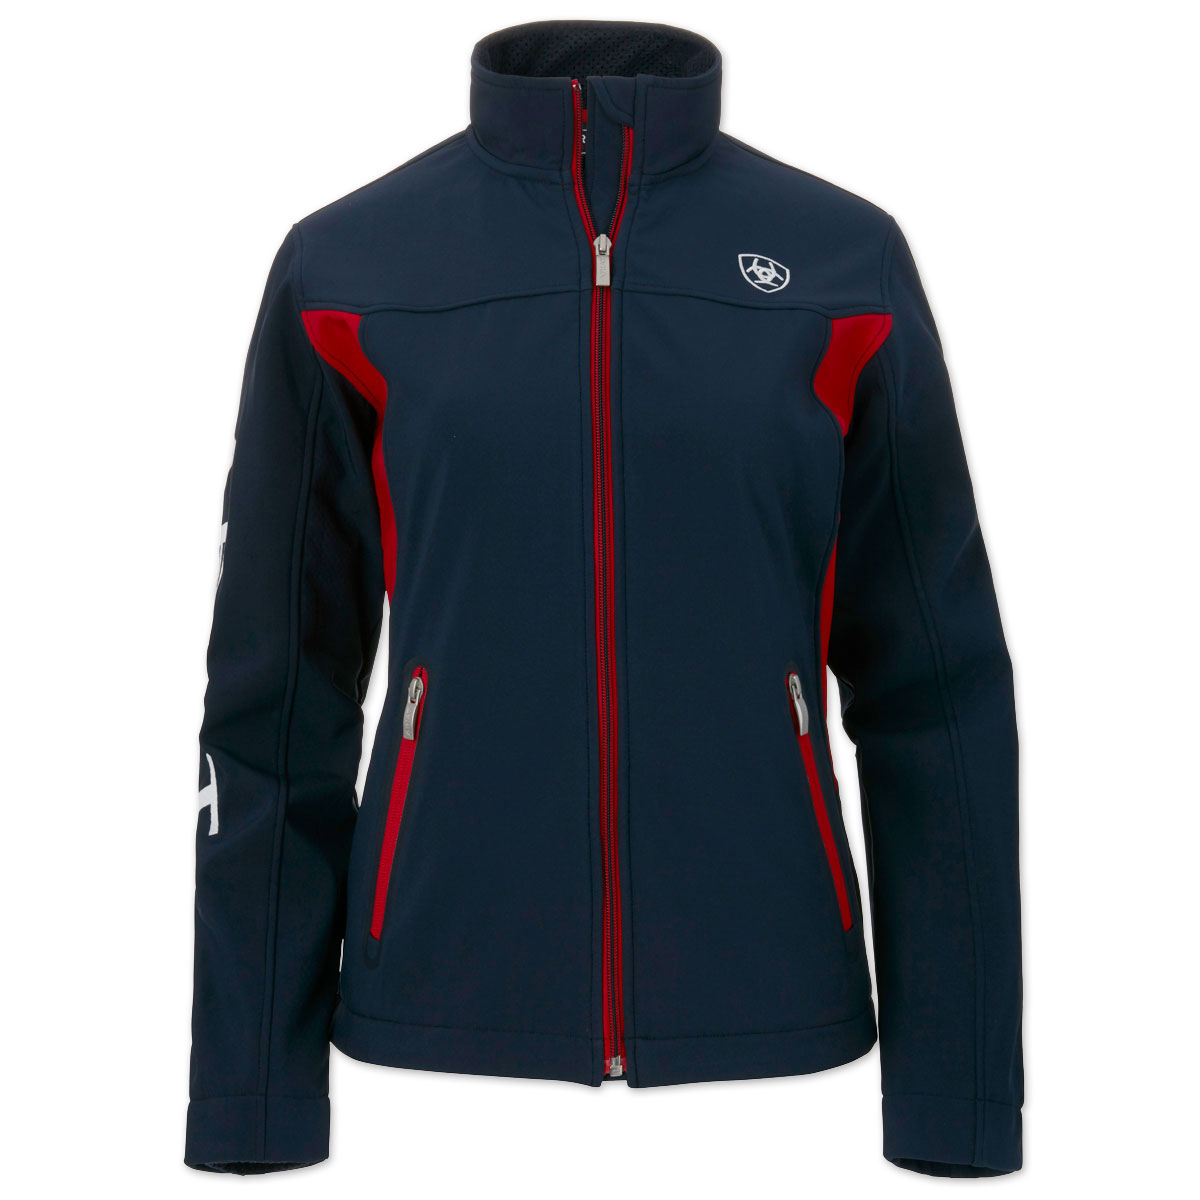 3bb03f3e86 Ariat Team Softshell Jacket